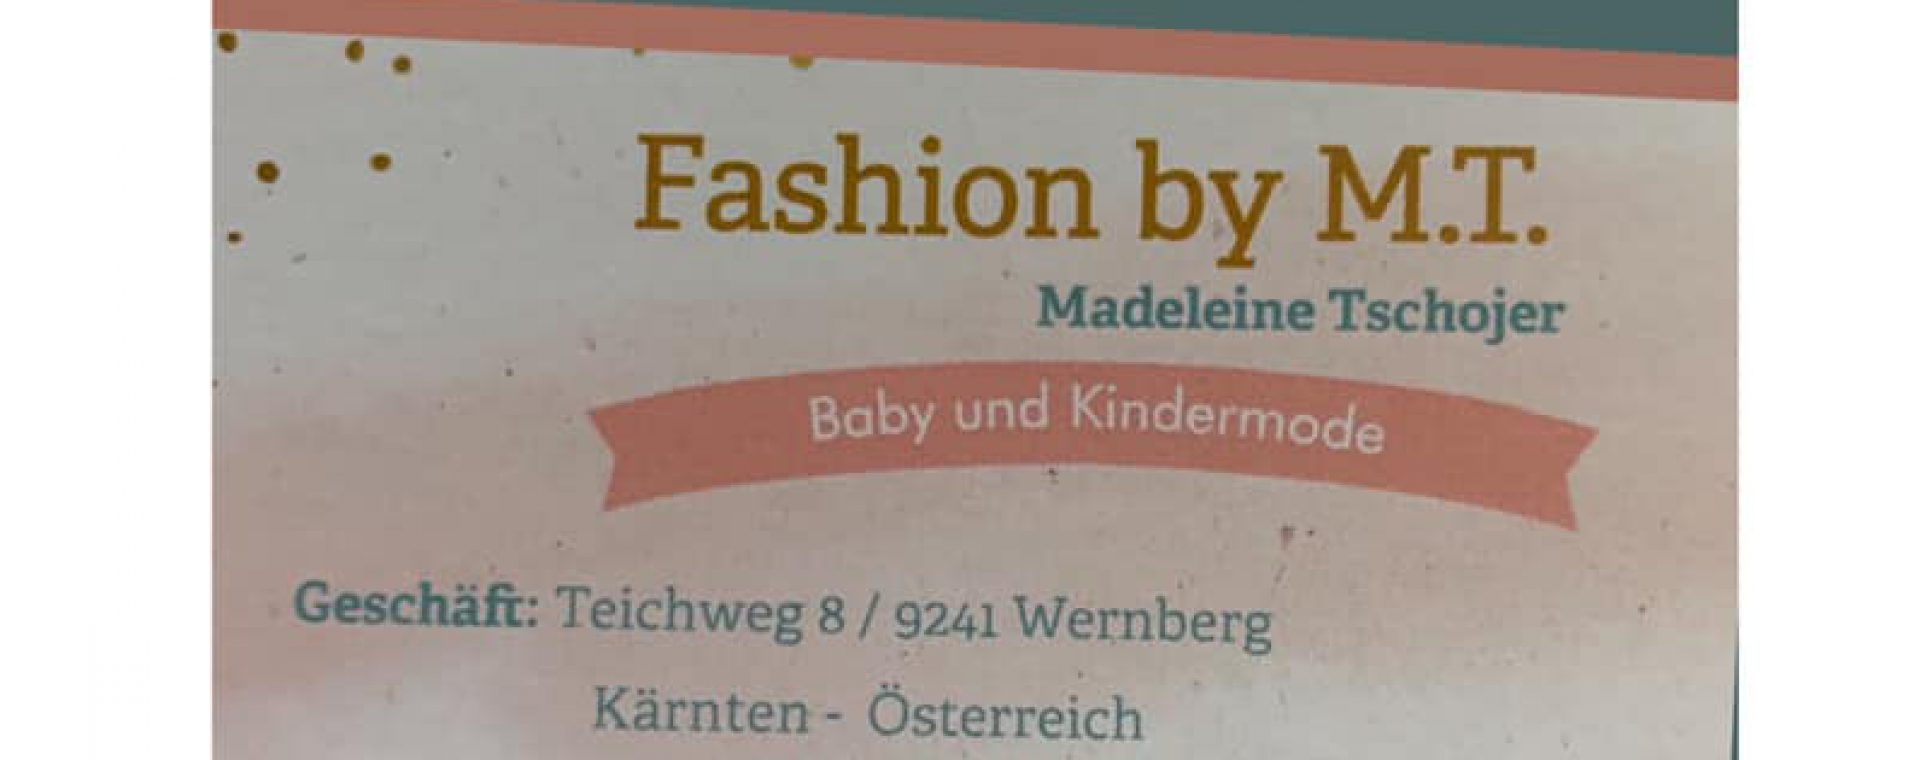 Fashion by M.T.